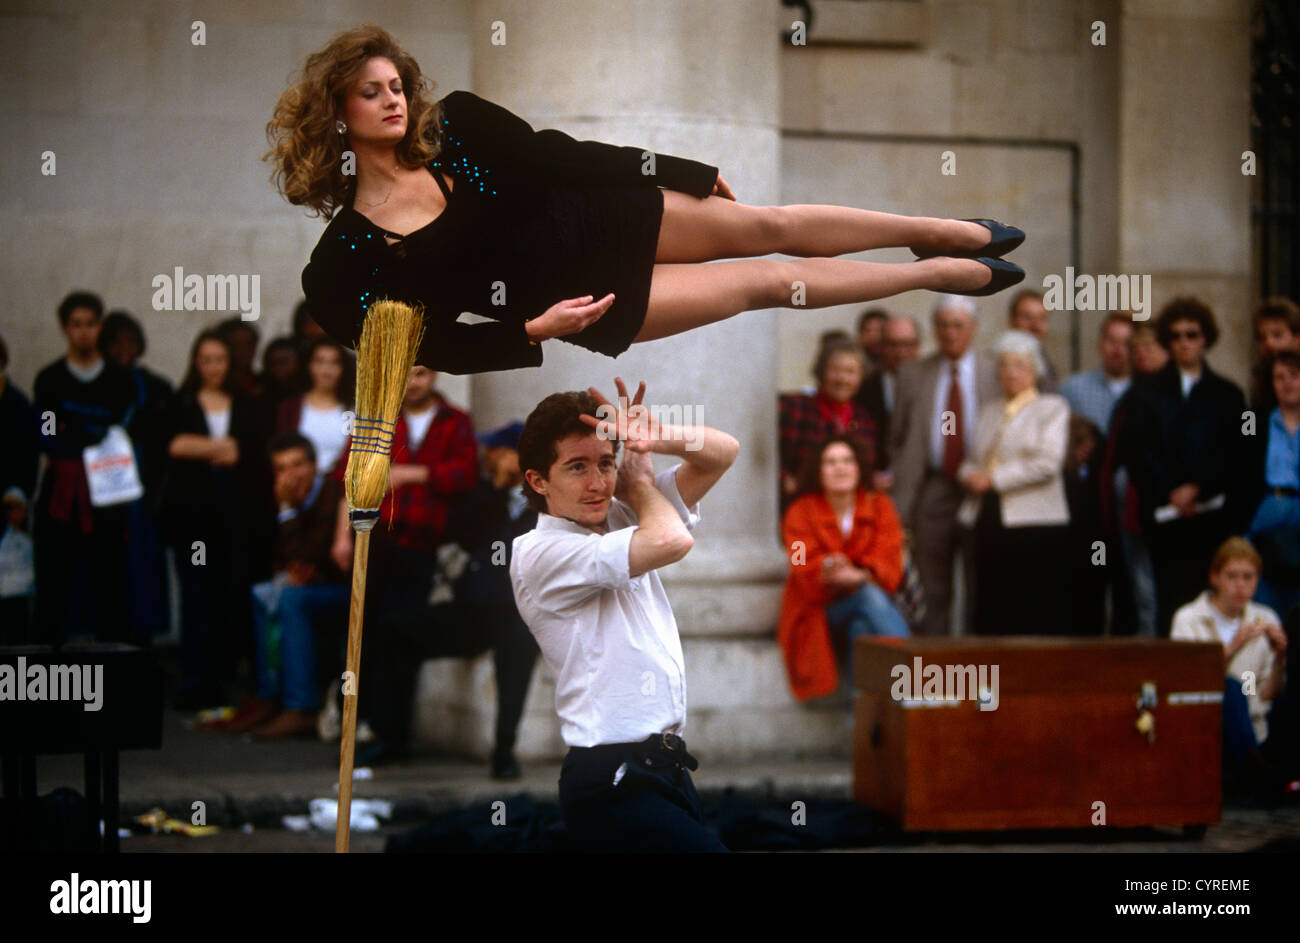 a-young-magician-performs-a-levitation-t